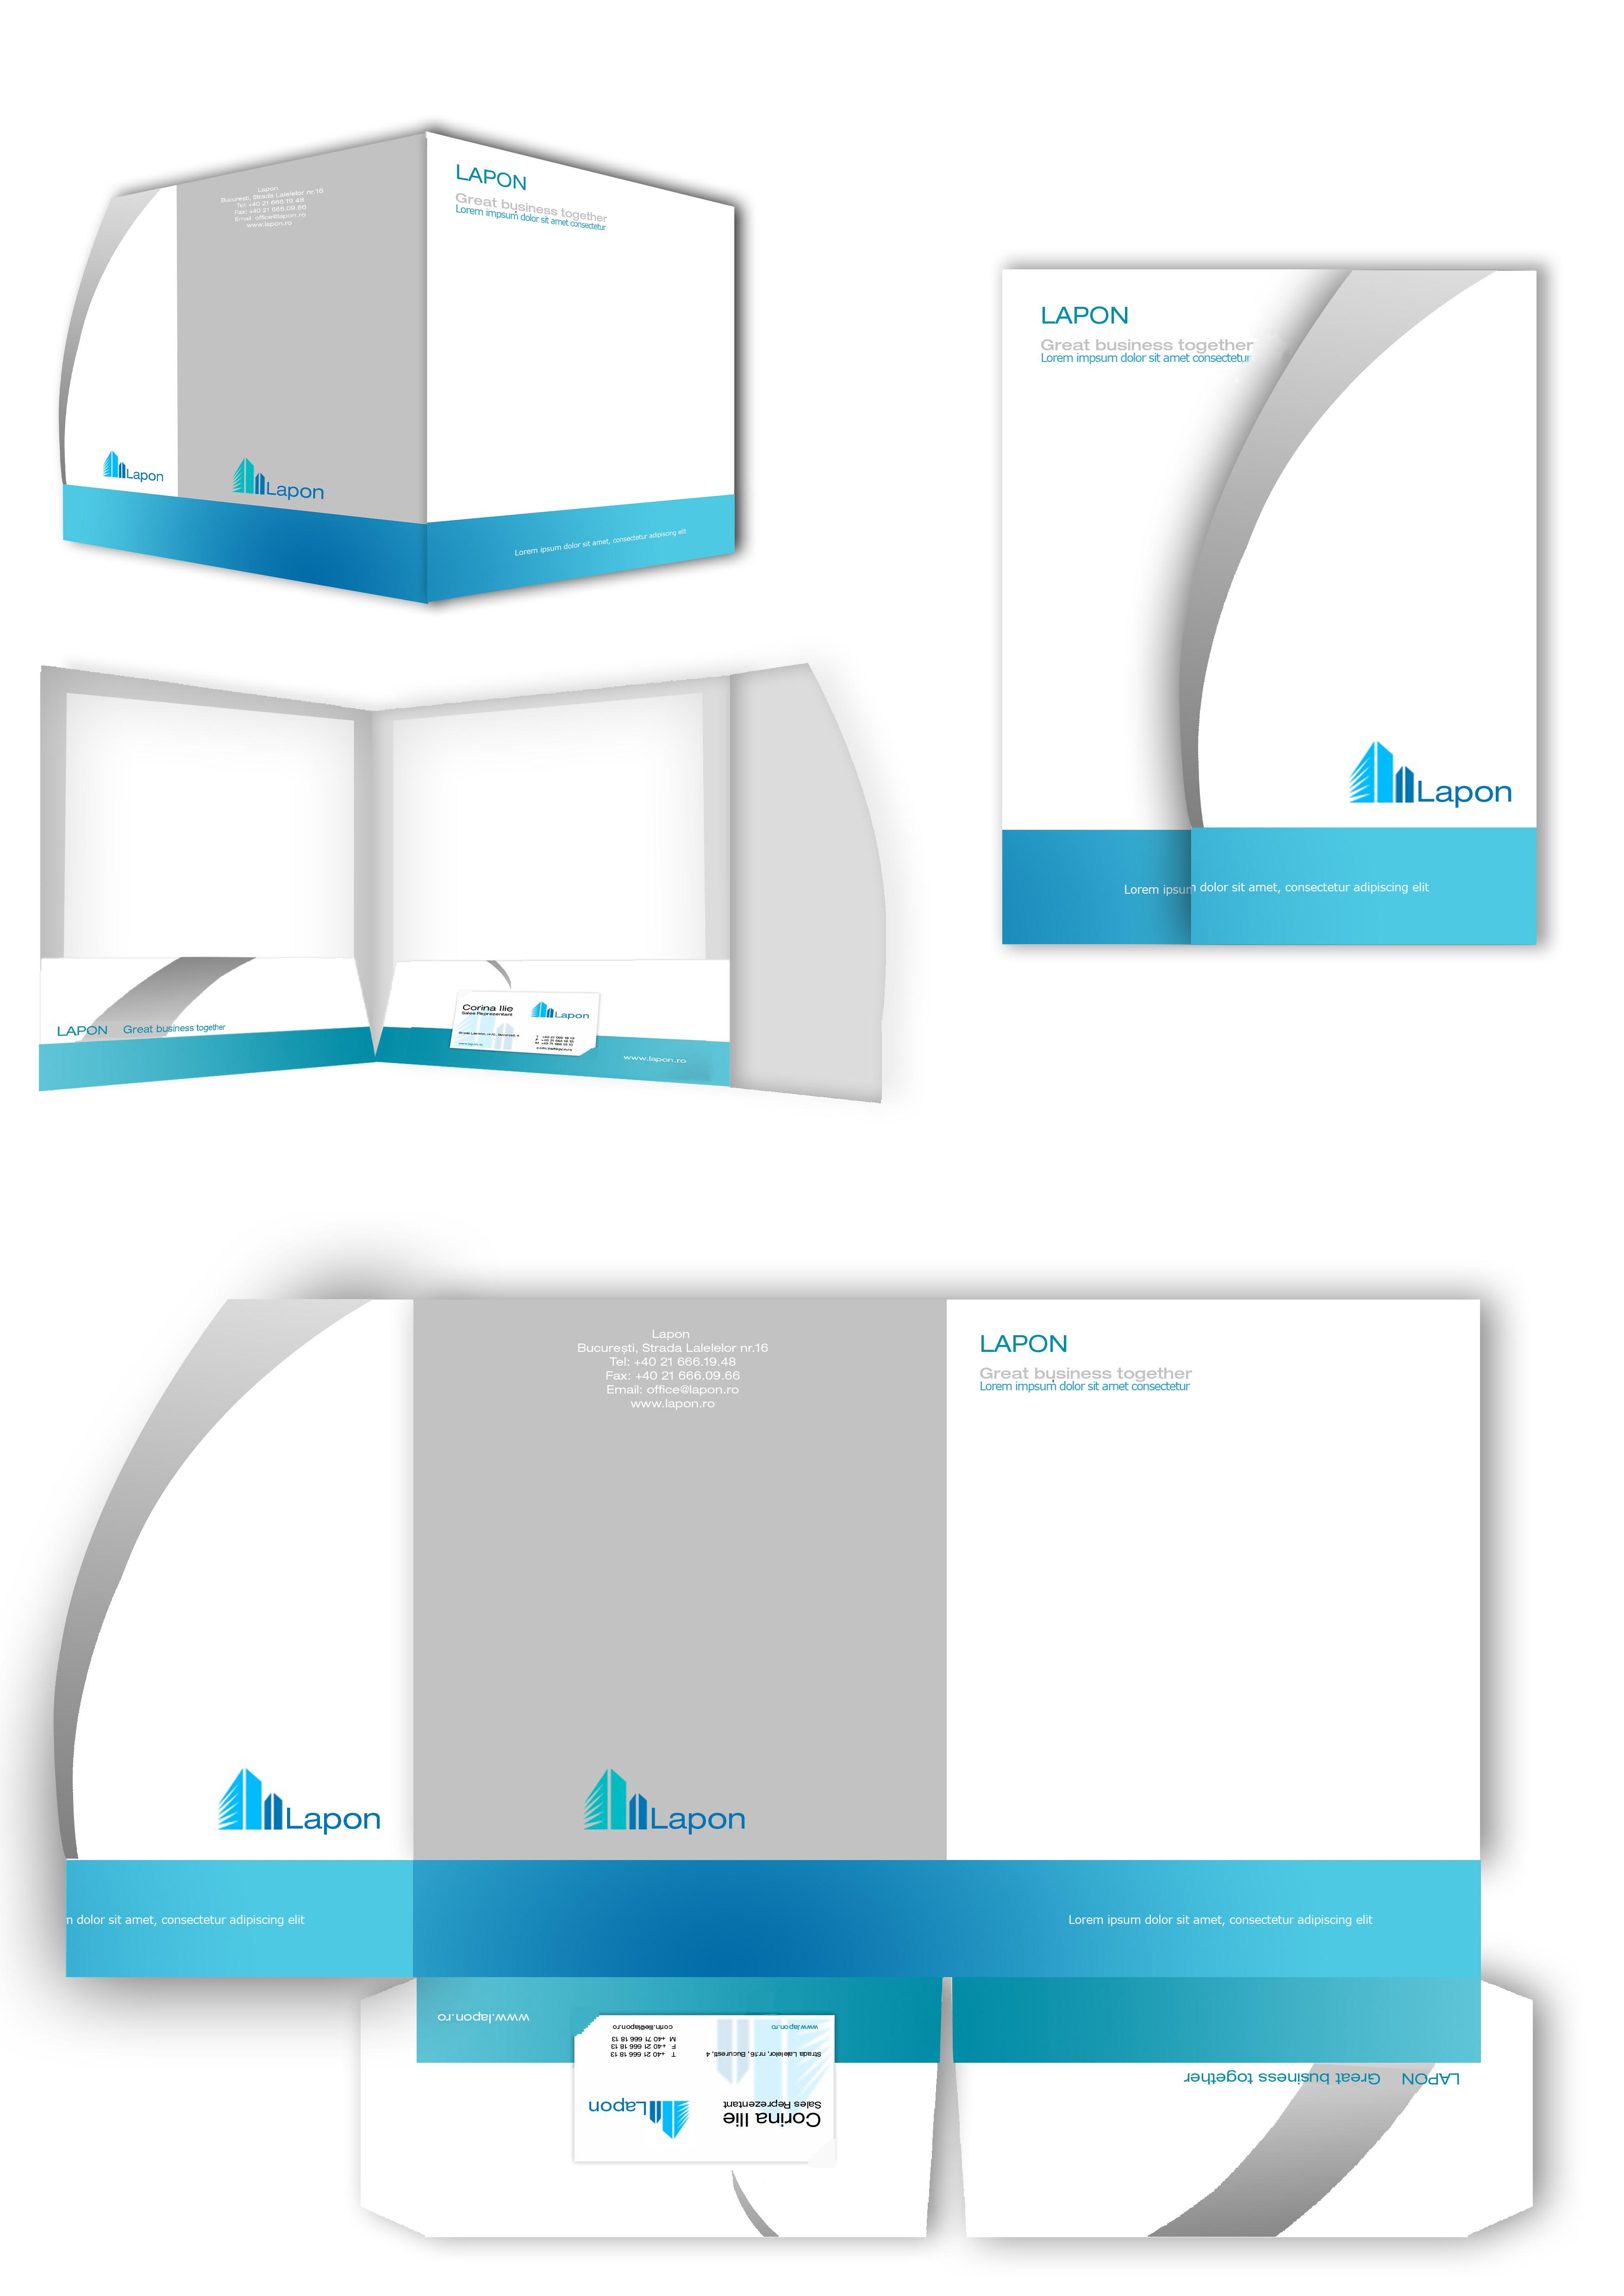 Creative Calendar Designs as well Layout besides Default additionally Modern Ui Dashboards Designs in addition Folder And Brochure Design. on web design layout ideas